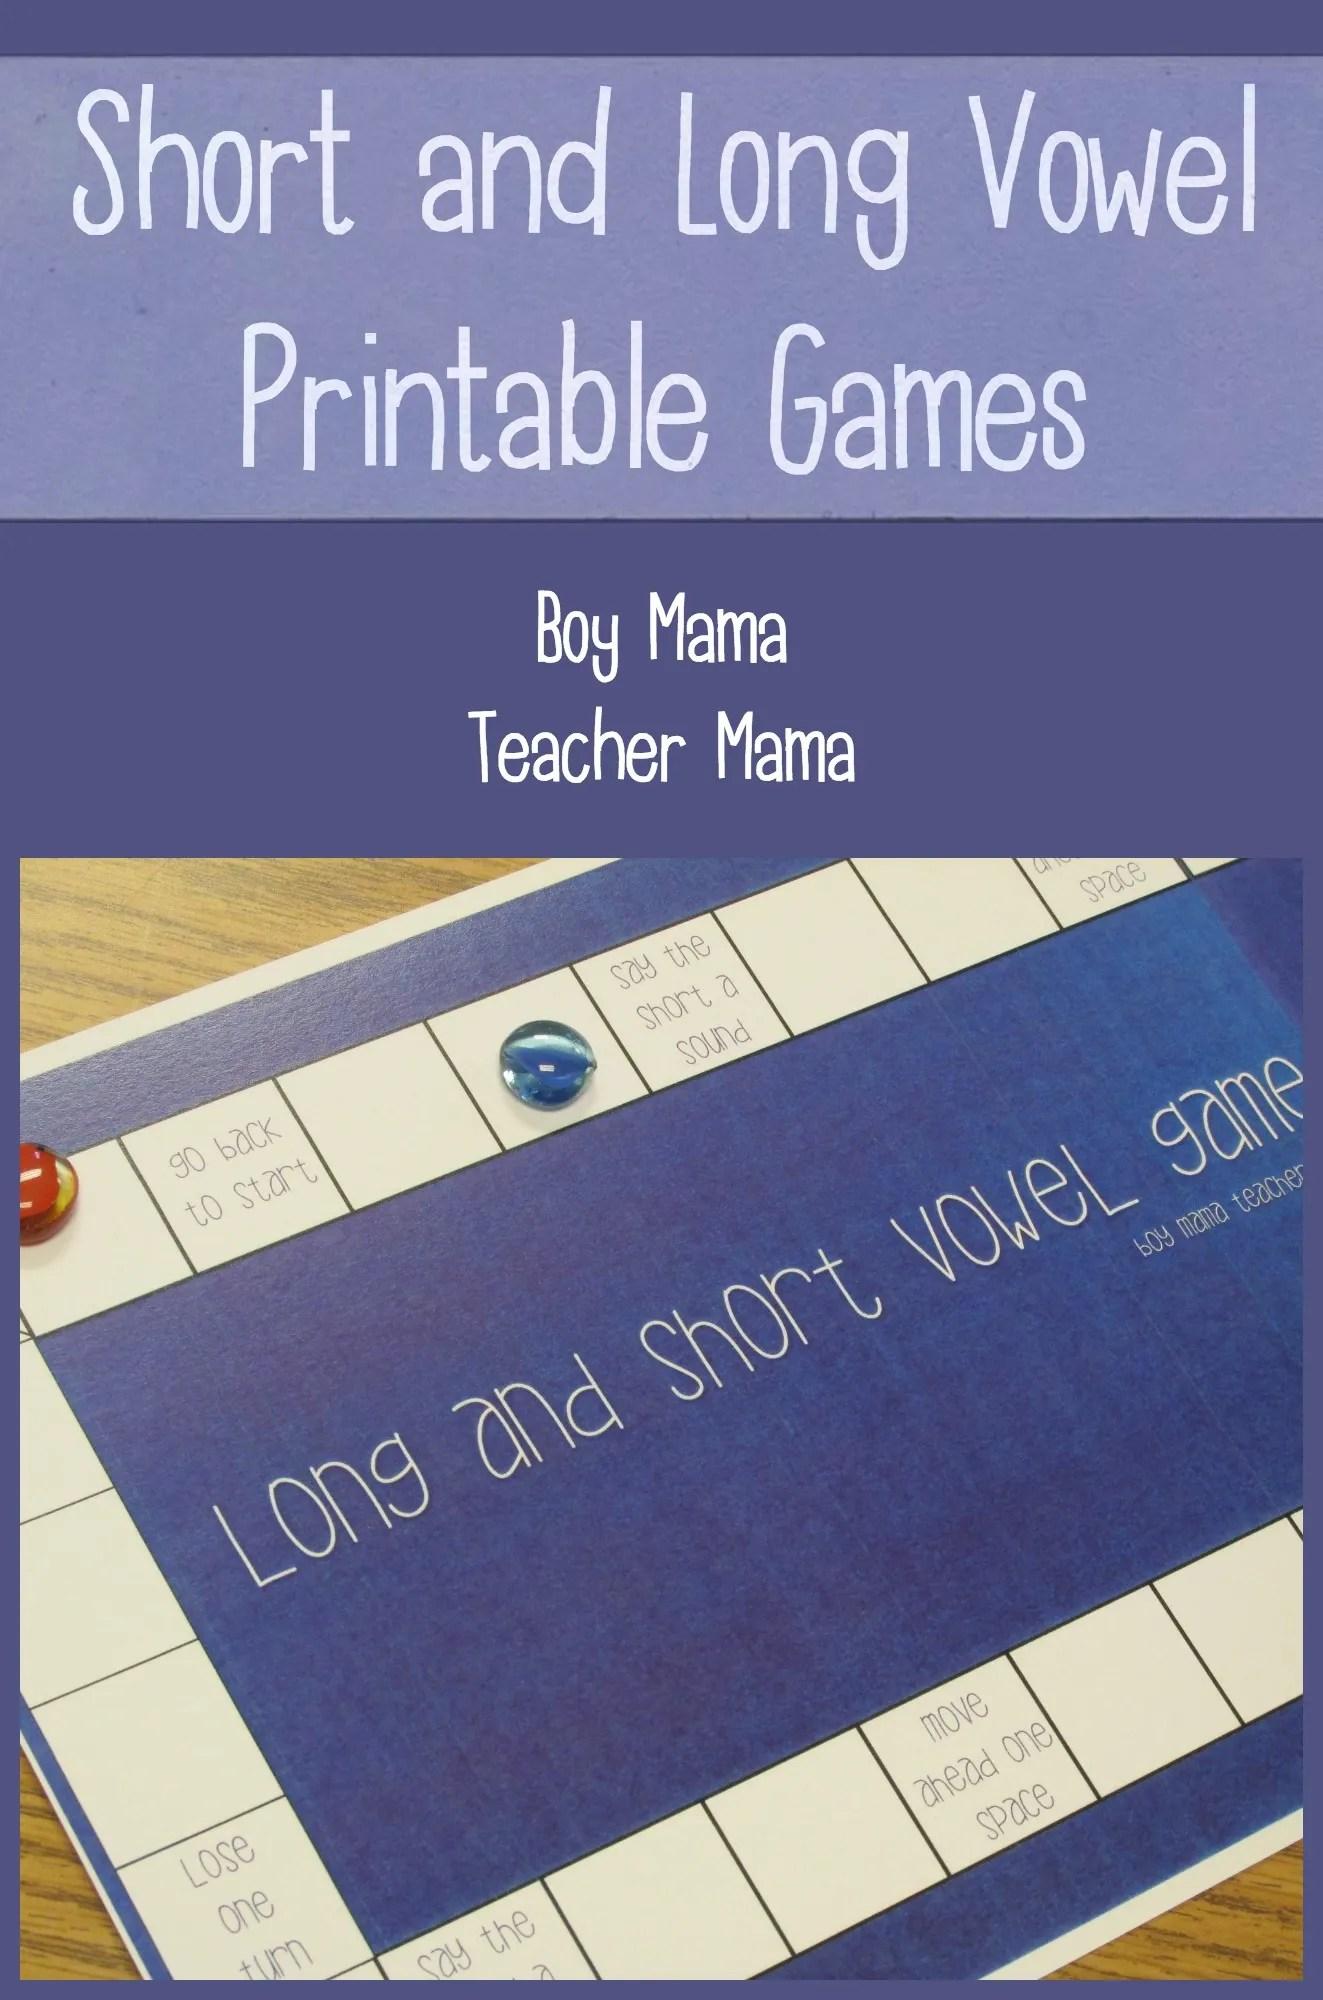 hight resolution of Teacher Mama: Short and Long Vowel Printable Games {After School Linky} -  Boy Mama Teacher Mama